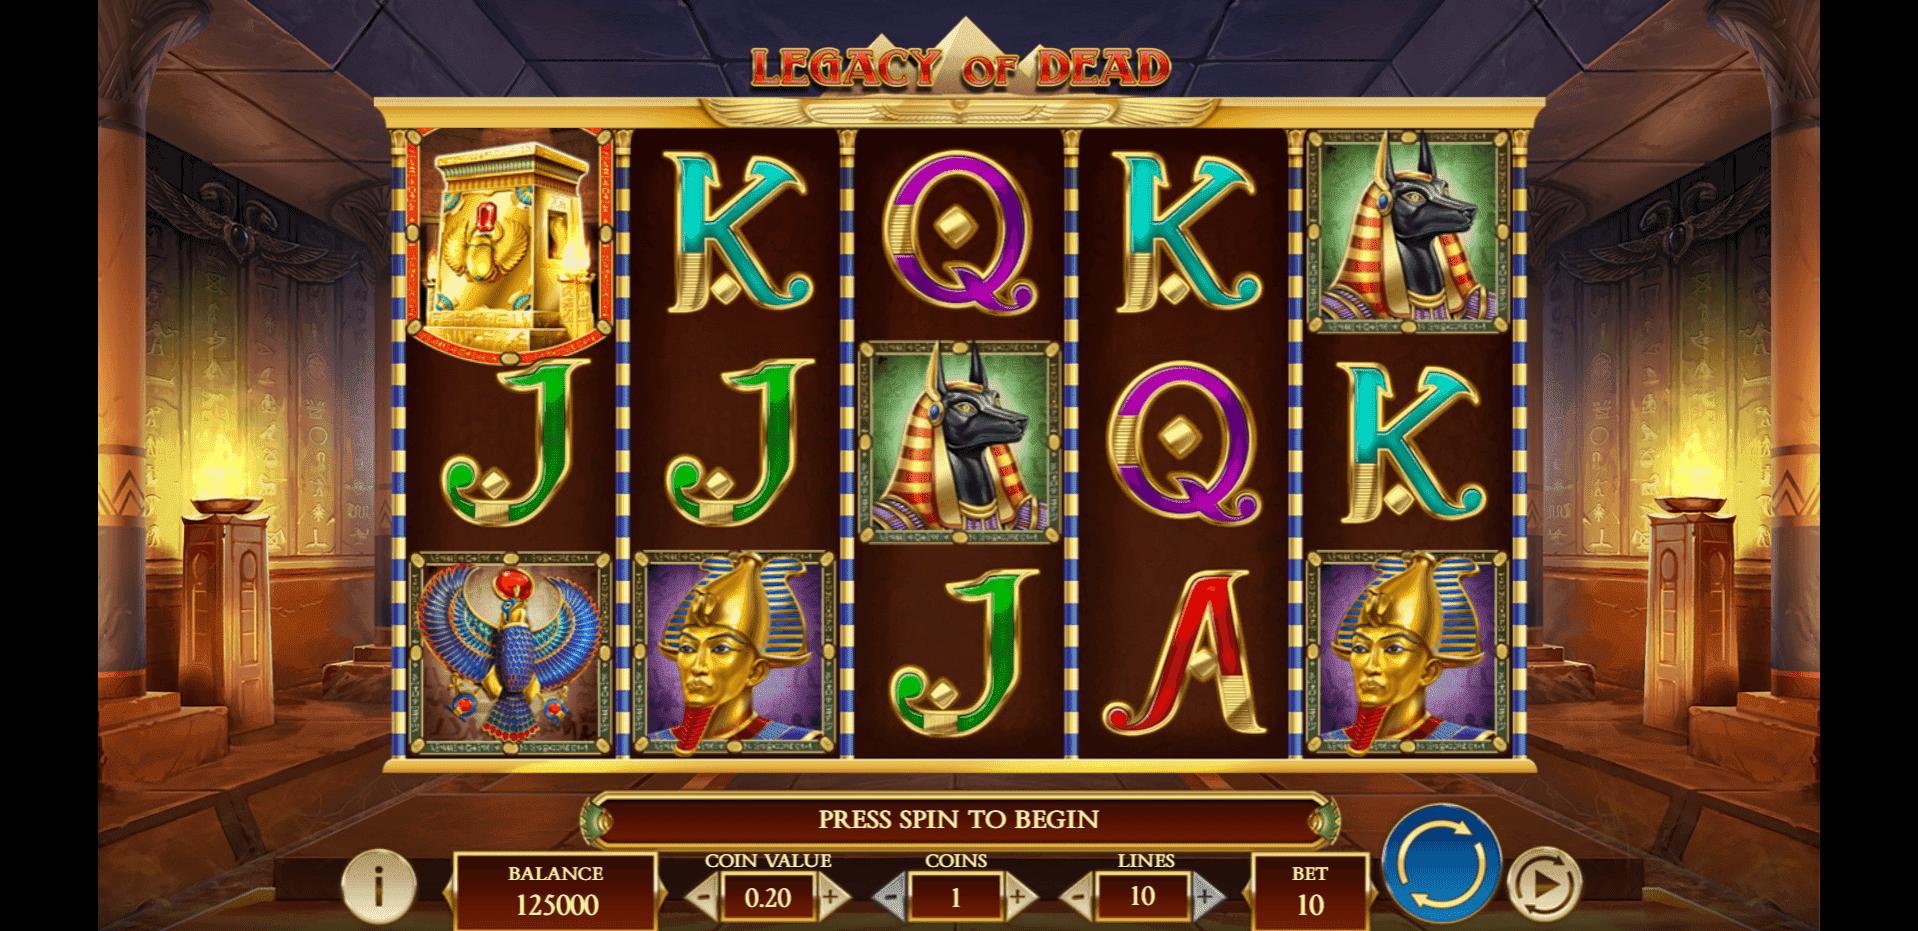 Legacy of Dead slot machine screenshot